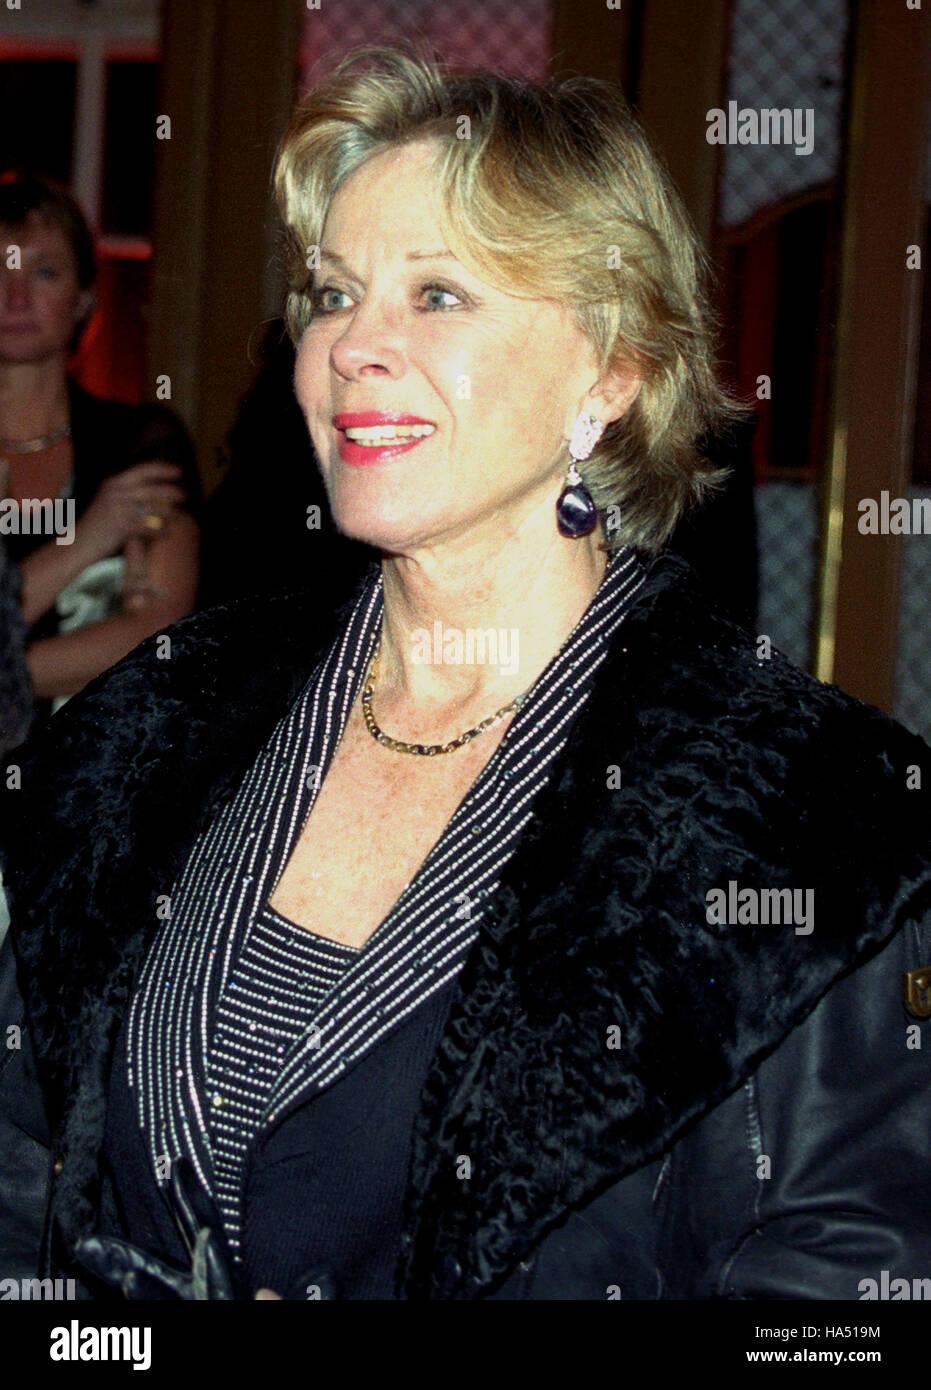 bibi andersson - photo #43